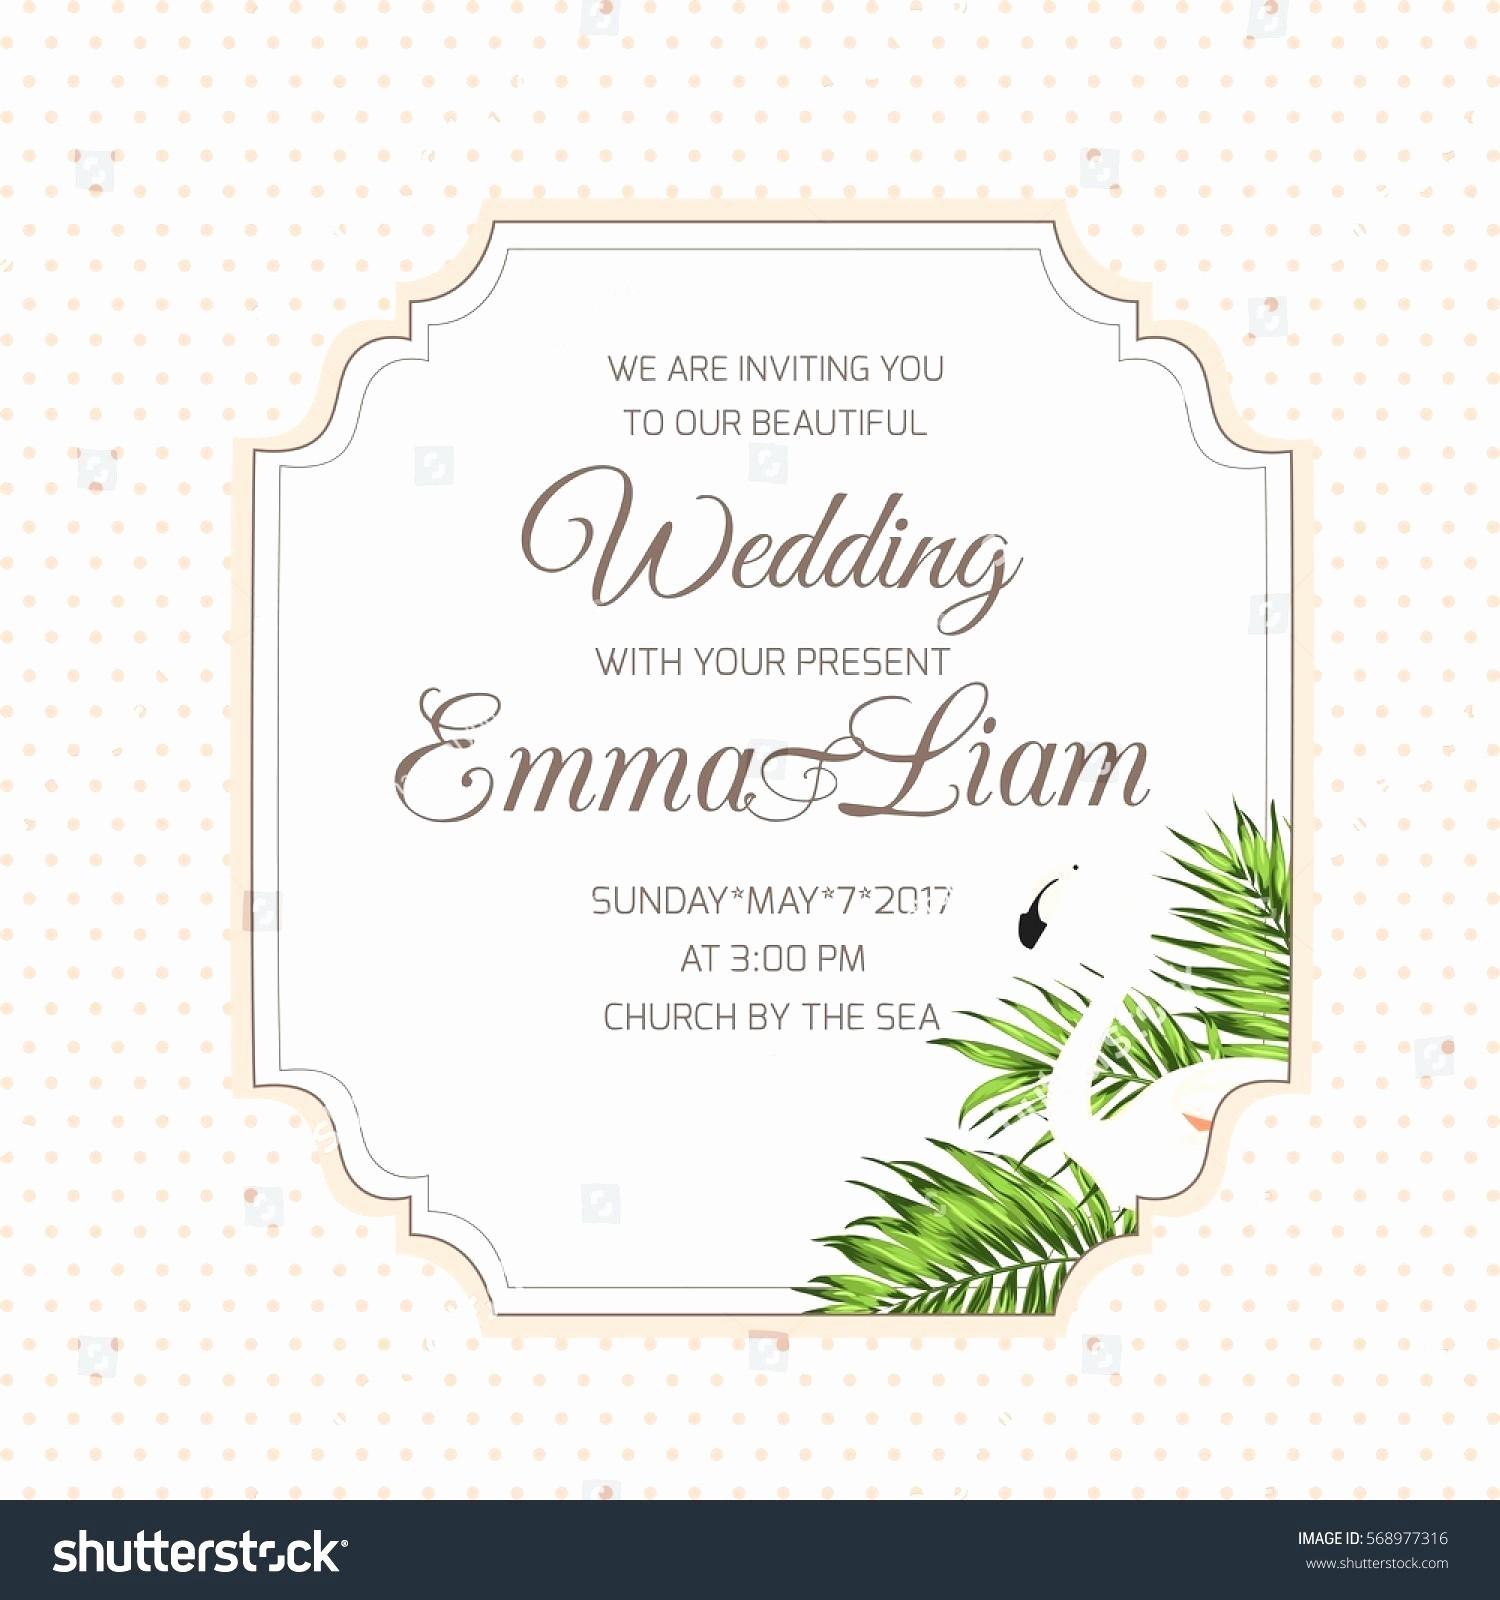 Wedding Response Card Template Free Luxury Free Printable Wedding Rsvp Card Templates Template Rsvp